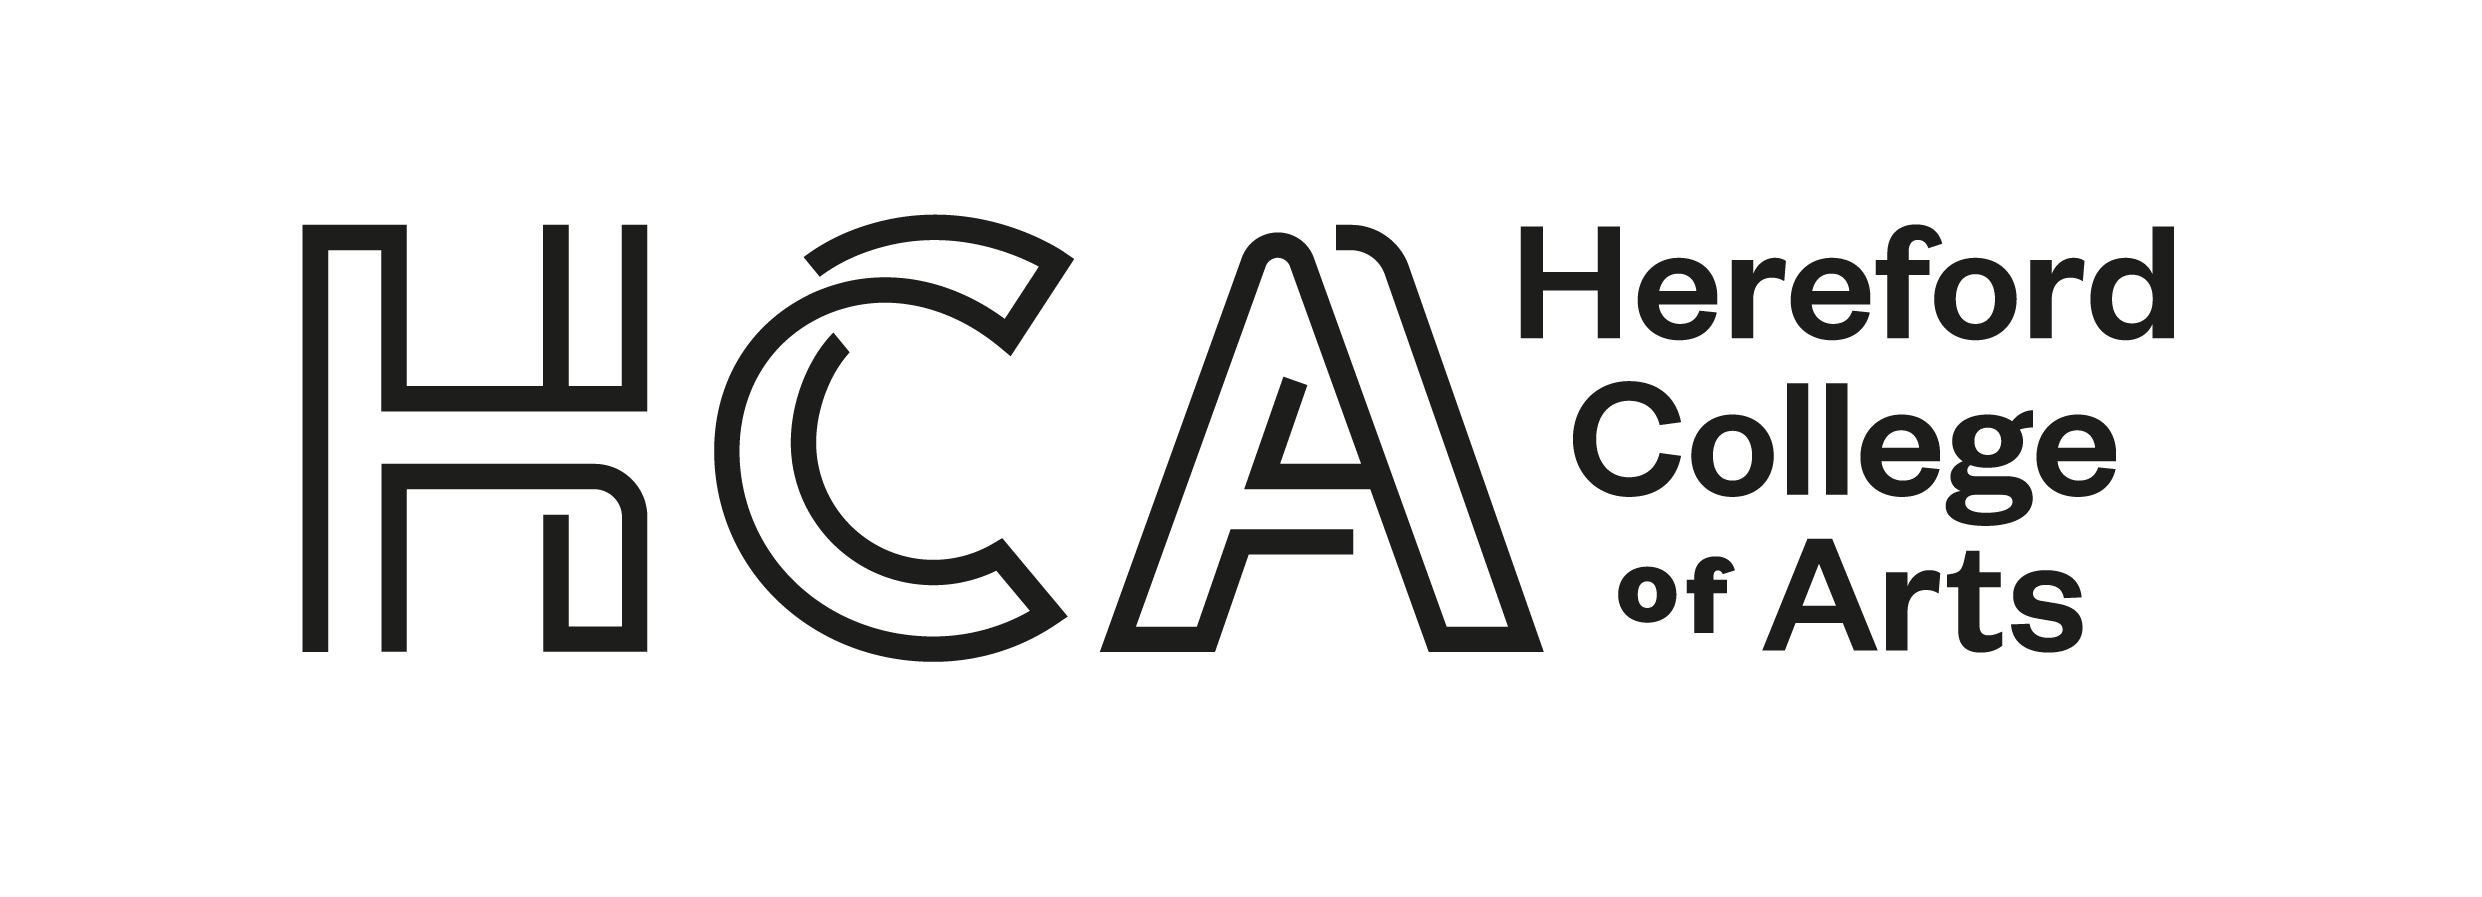 HCA_Logo_FullLogo.png